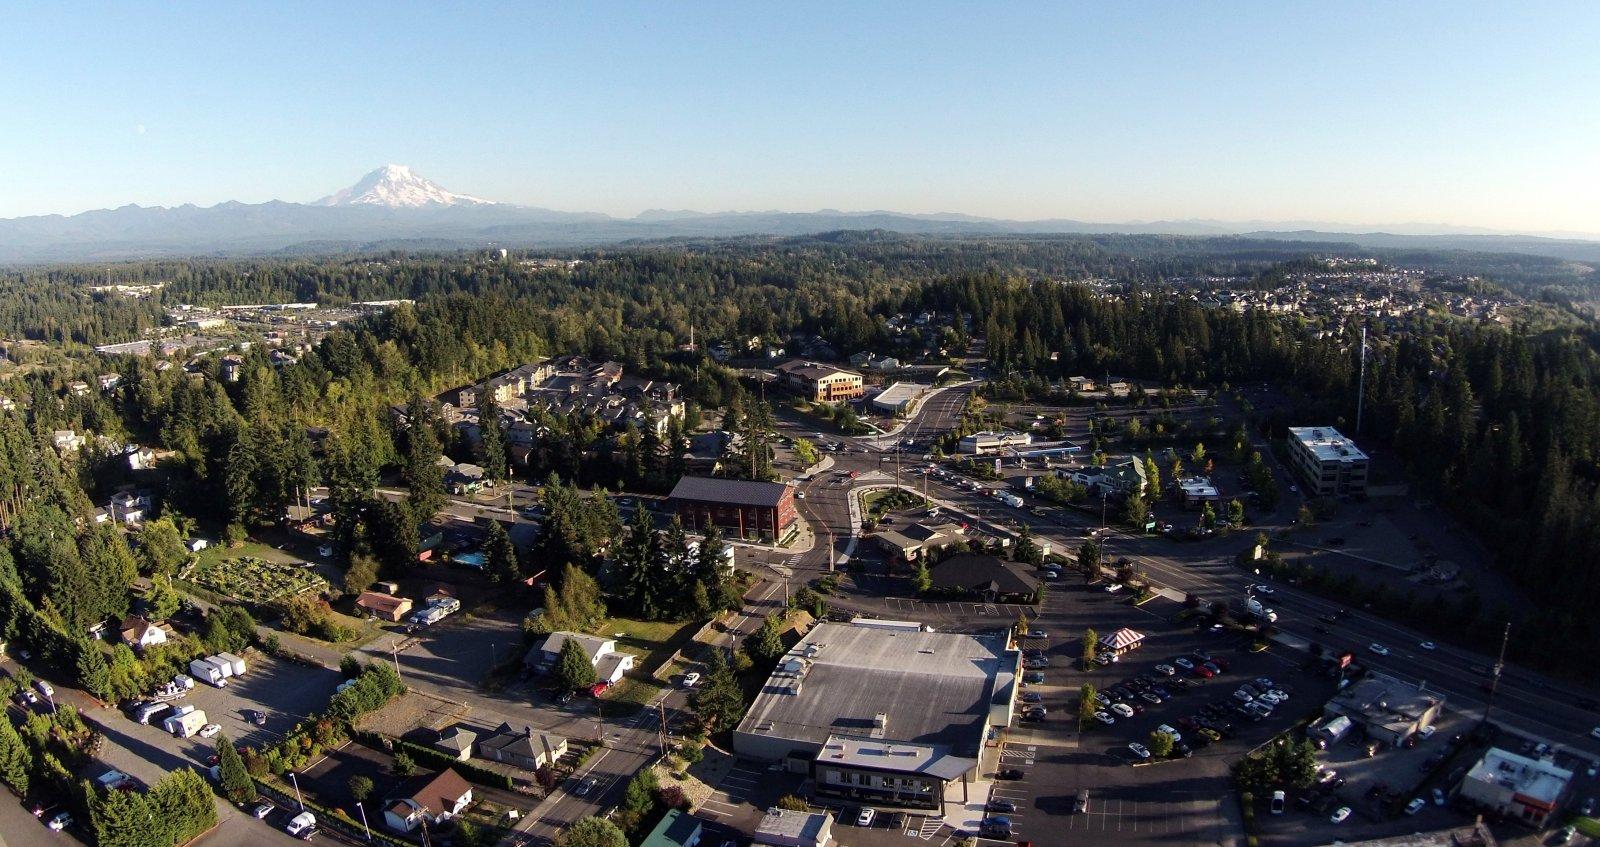 Click image for larger version  Name:Mount Rainier via Bonney Lake Crop.jpg Views:100 Size:318.5 KB ID:115577